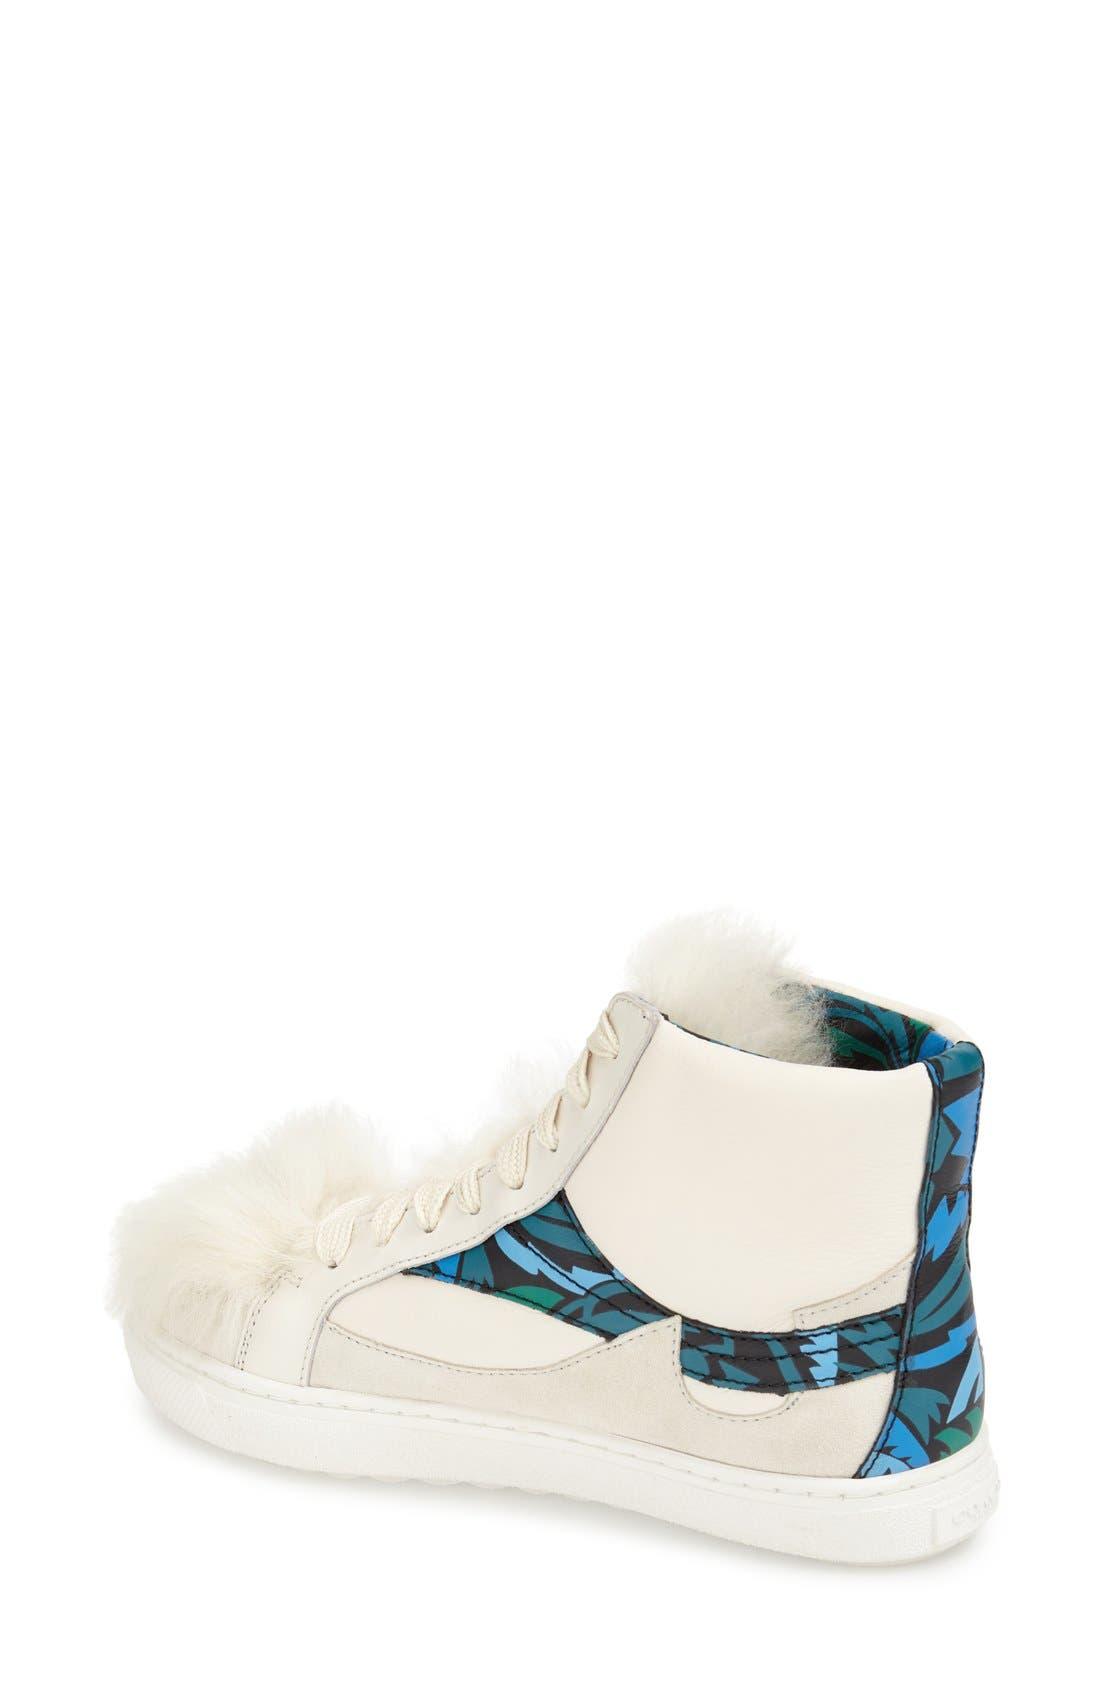 COACH, Genuine Shearling High Top Sneaker, Alternate thumbnail 3, color, 188